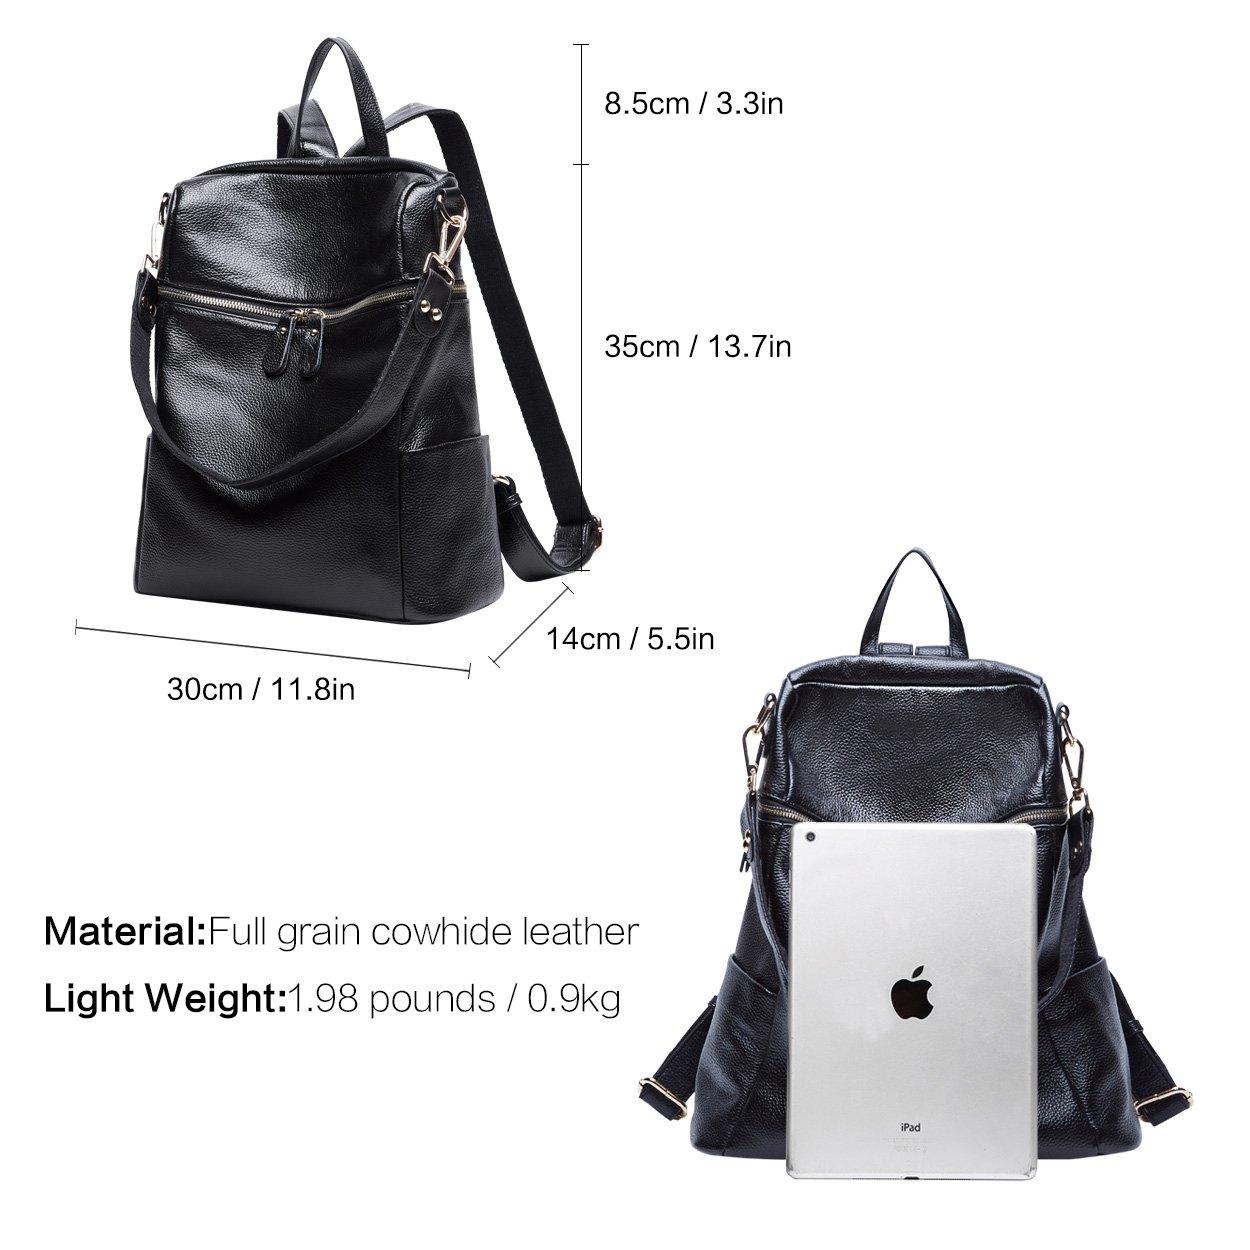 BOYATU Convertible Genuine Leather Backpack Purse for Women Fashion Travel Bag (Black) by BOYATU (Image #4)